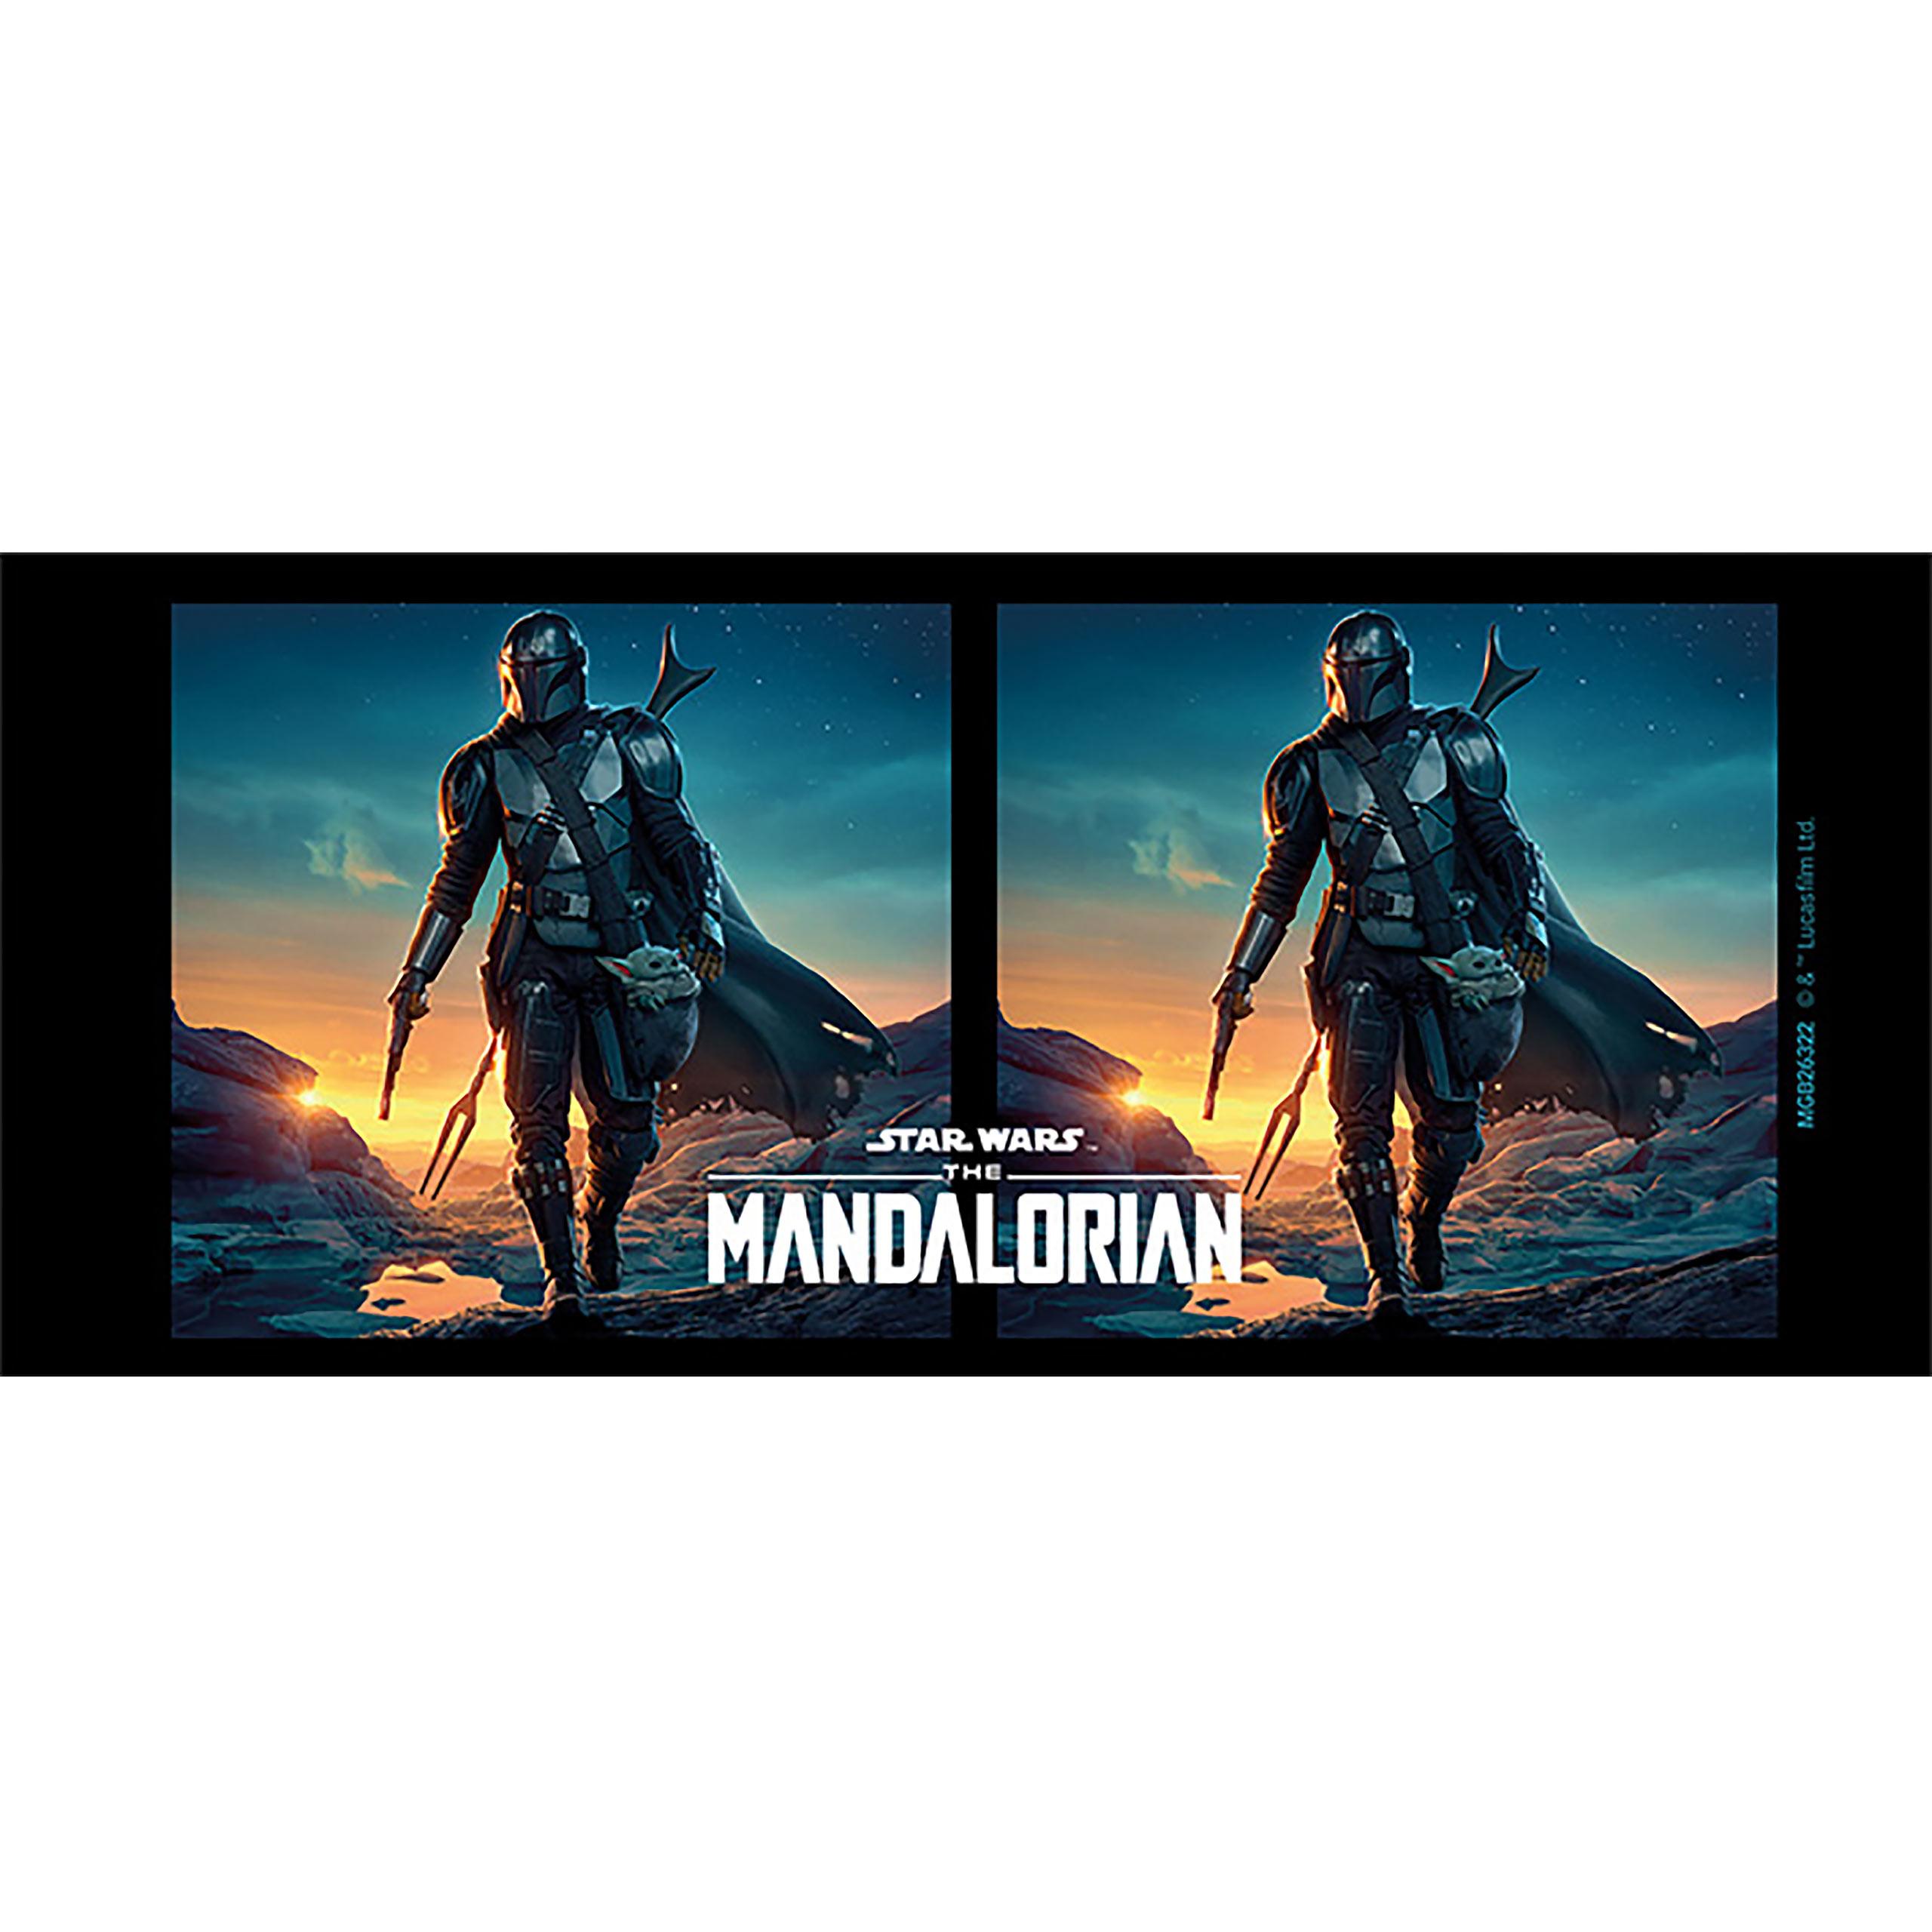 Mandalorianer Nightfall Tasse - Star Wars The Mandalorian